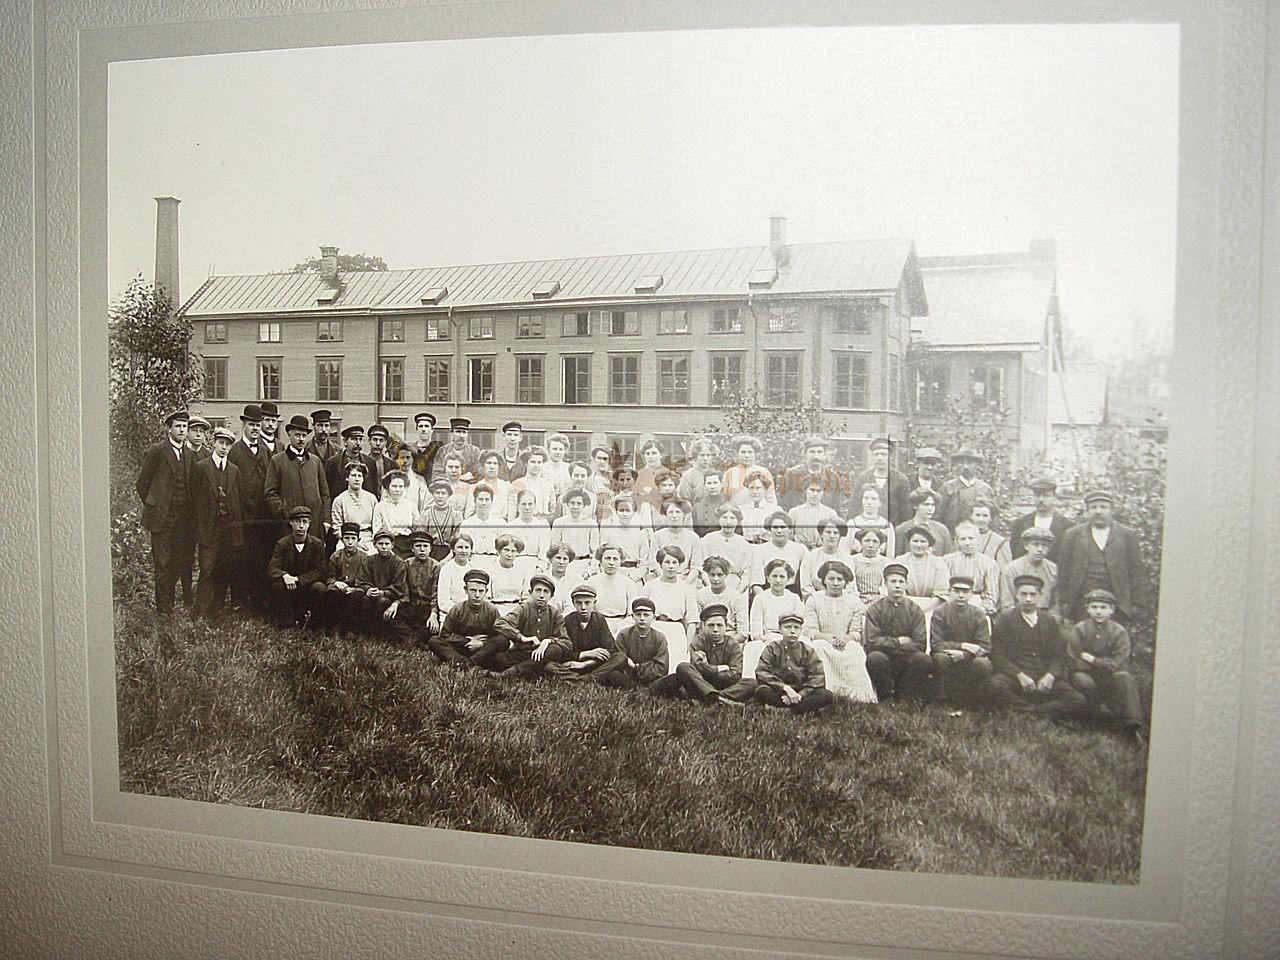 Karl                                                         Wassberg Boras                                                         Orig. Cabinet                                                         Photograph                                                         Swedish School